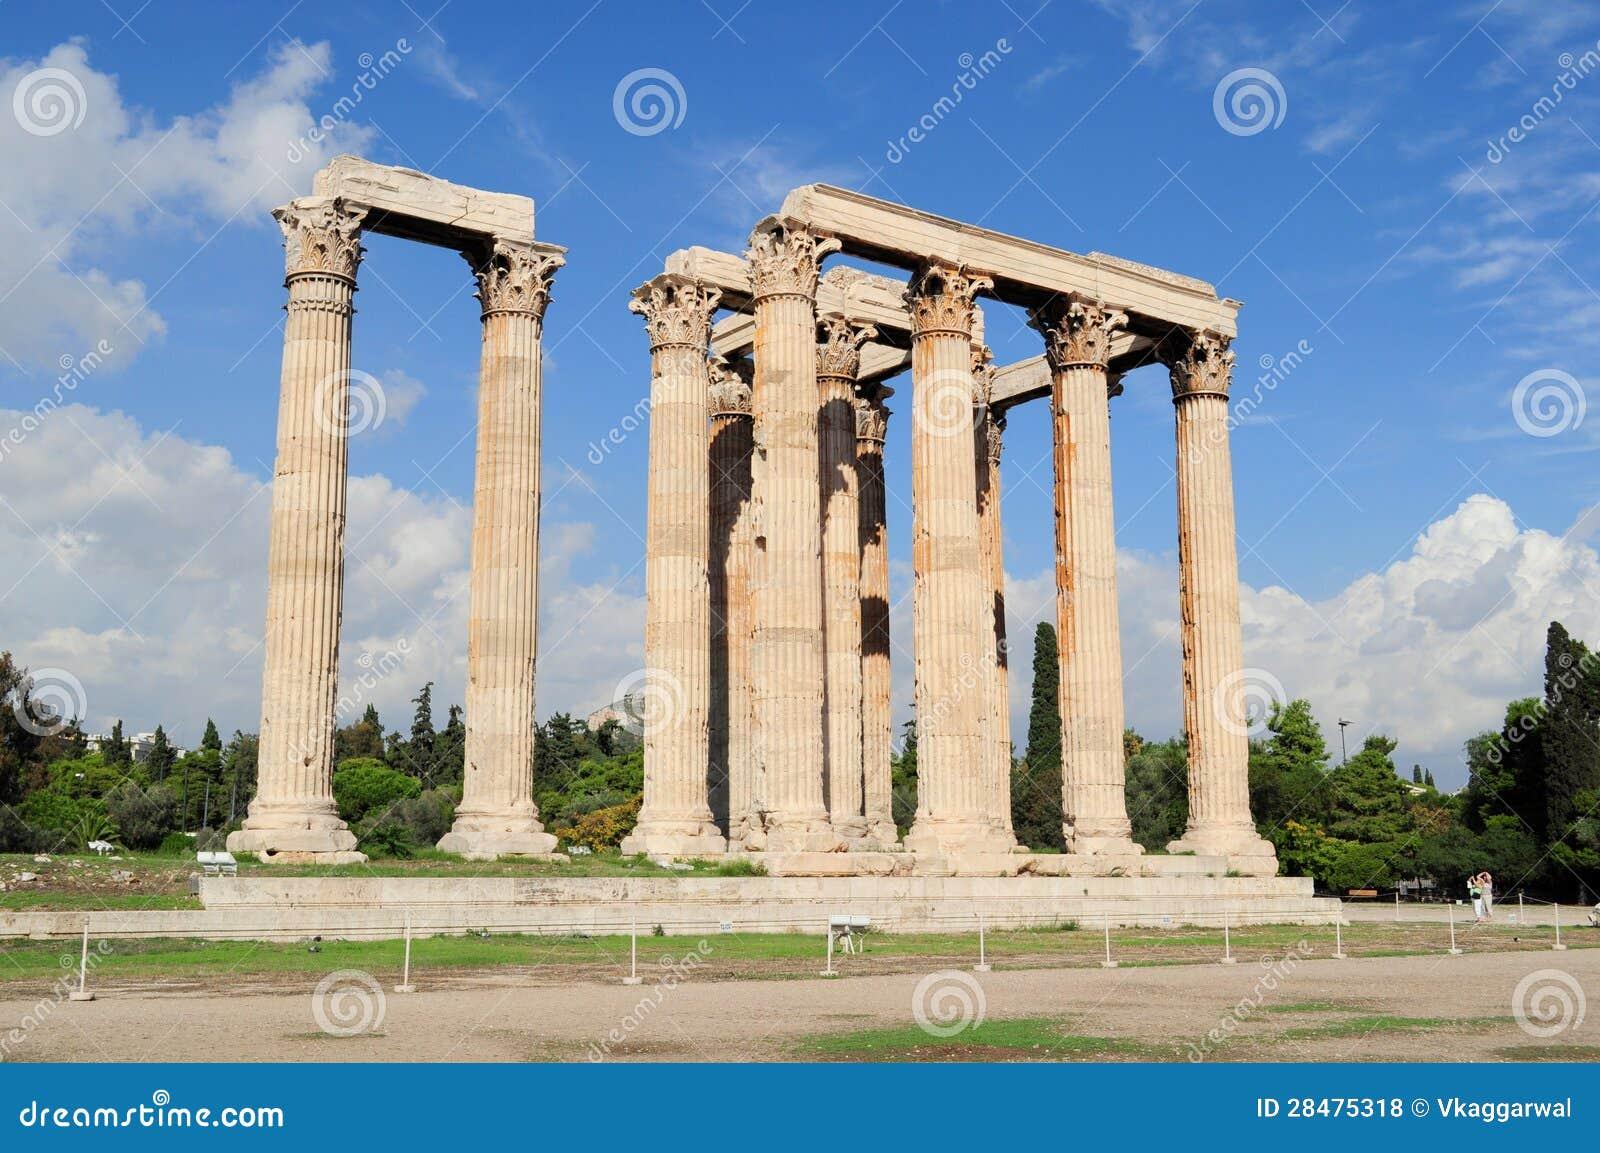 Temple of Zeus, Olympia, Greece.